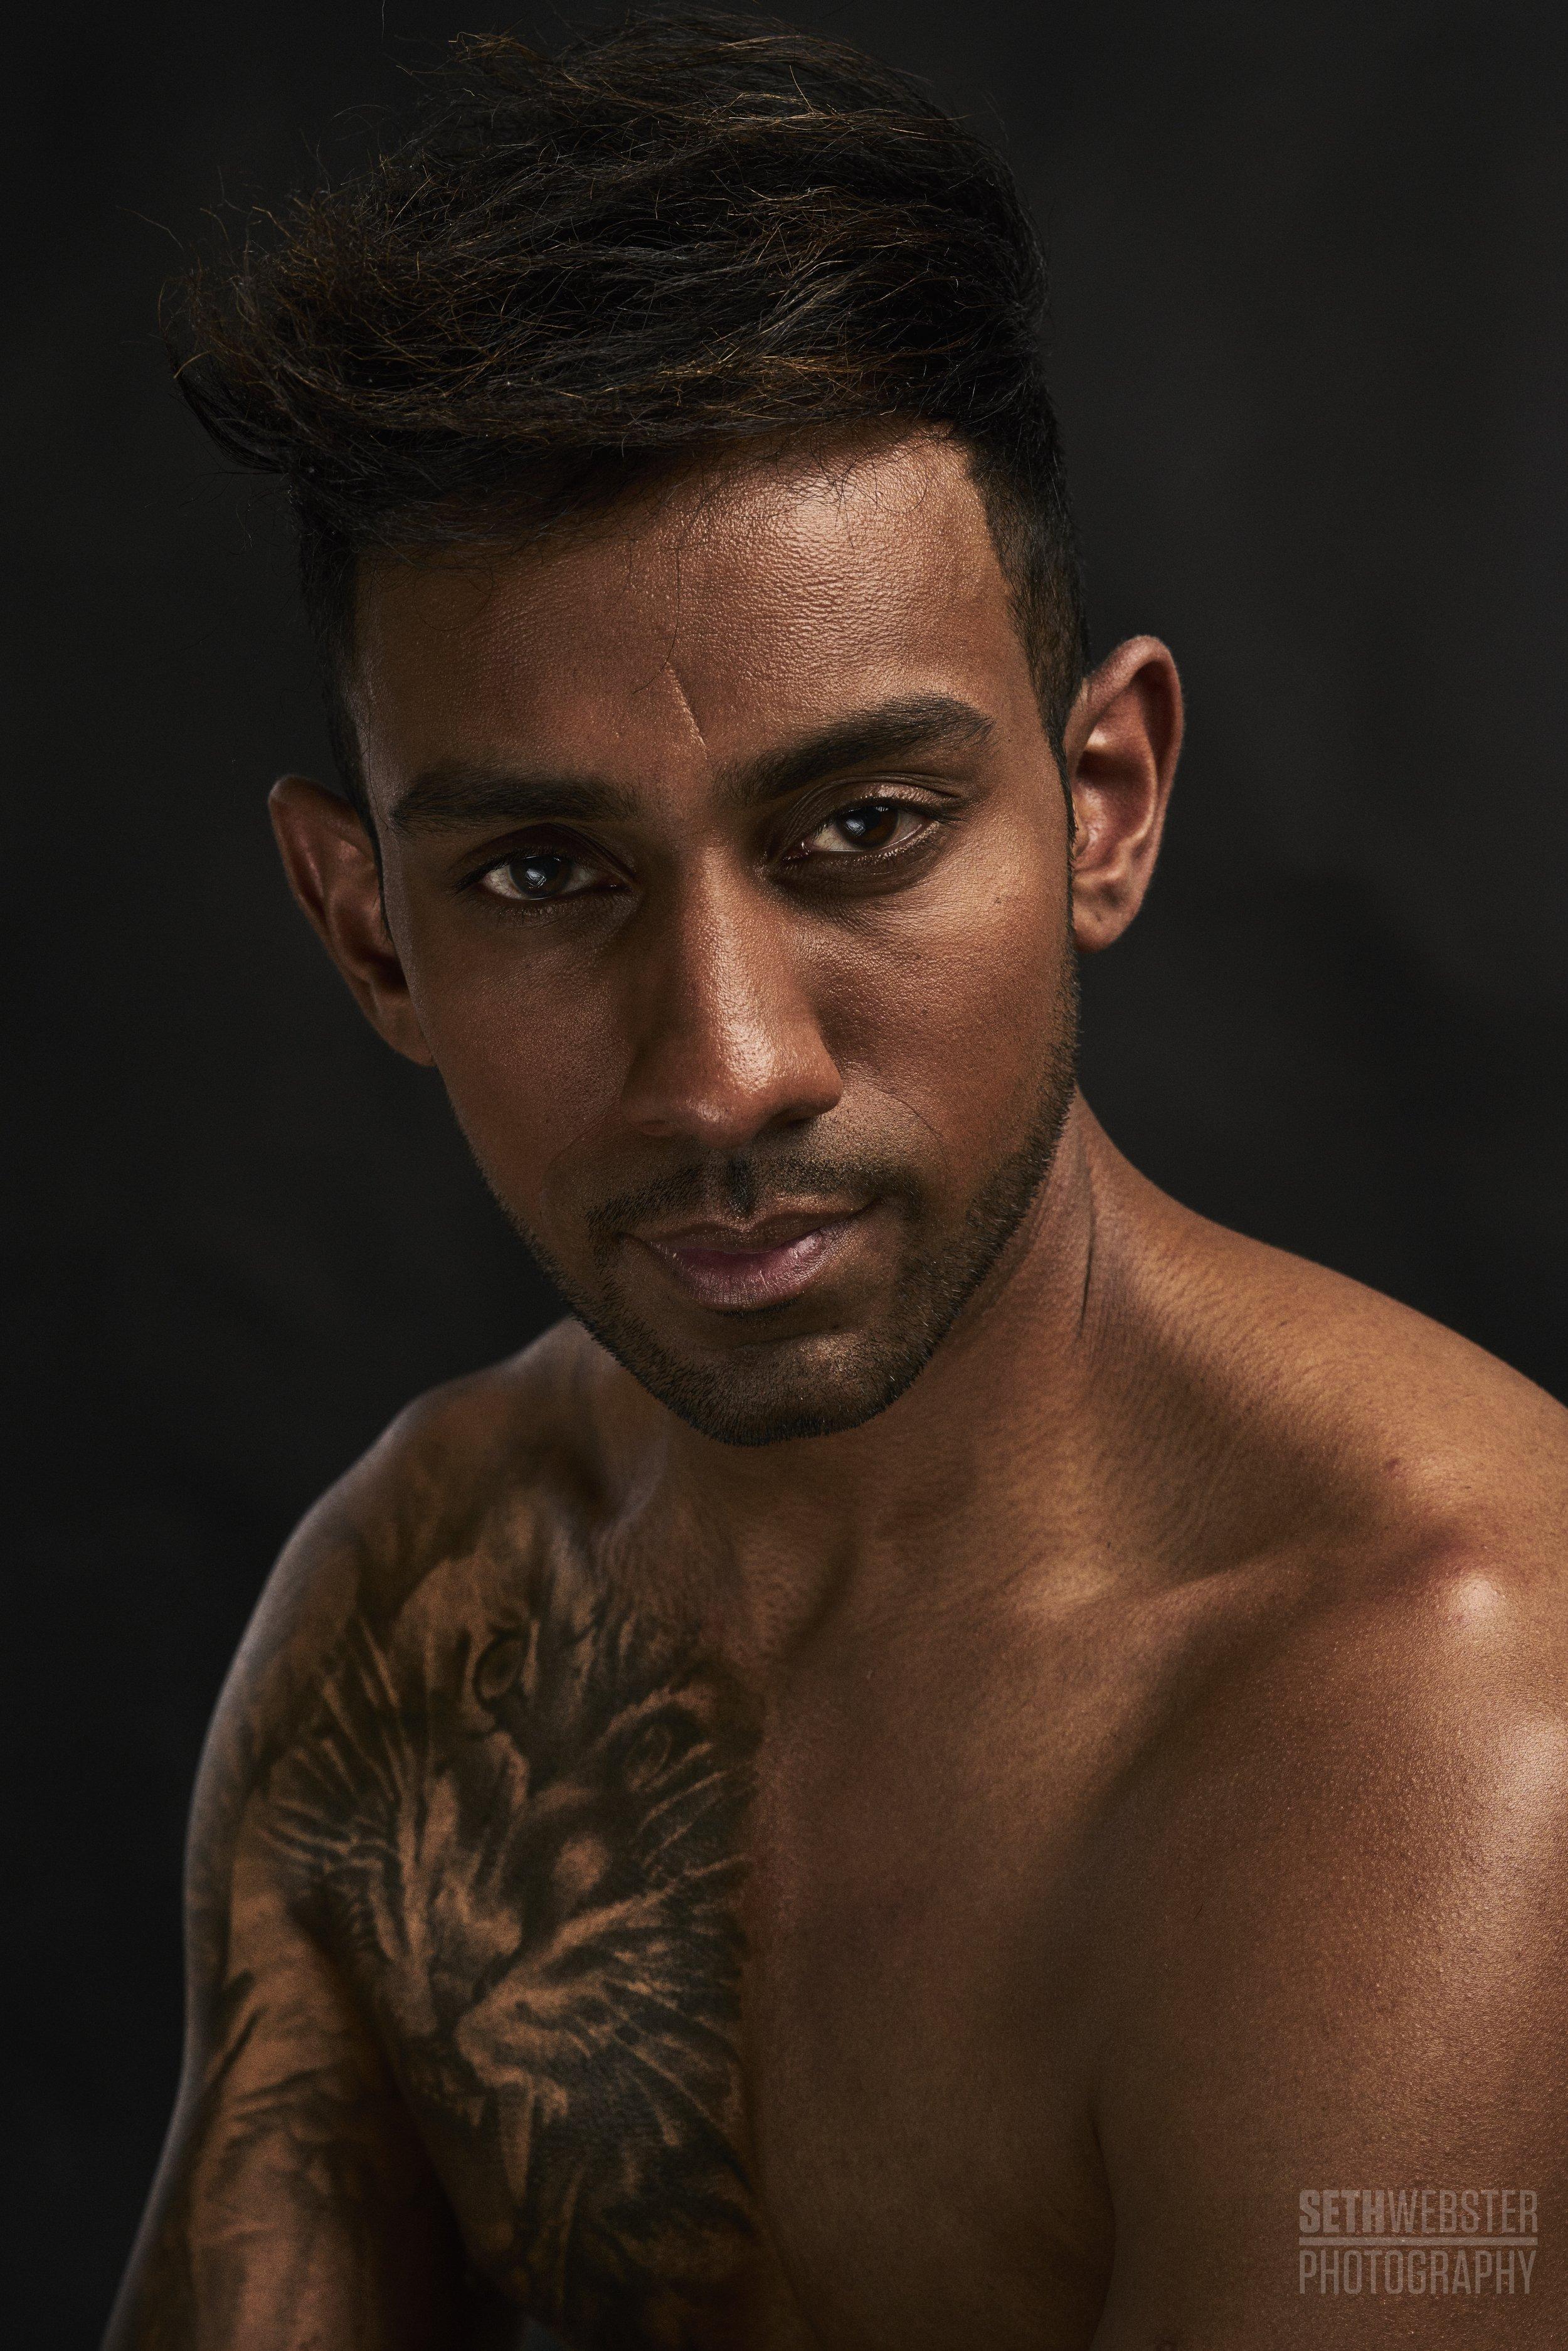 Devand Marajh, Model